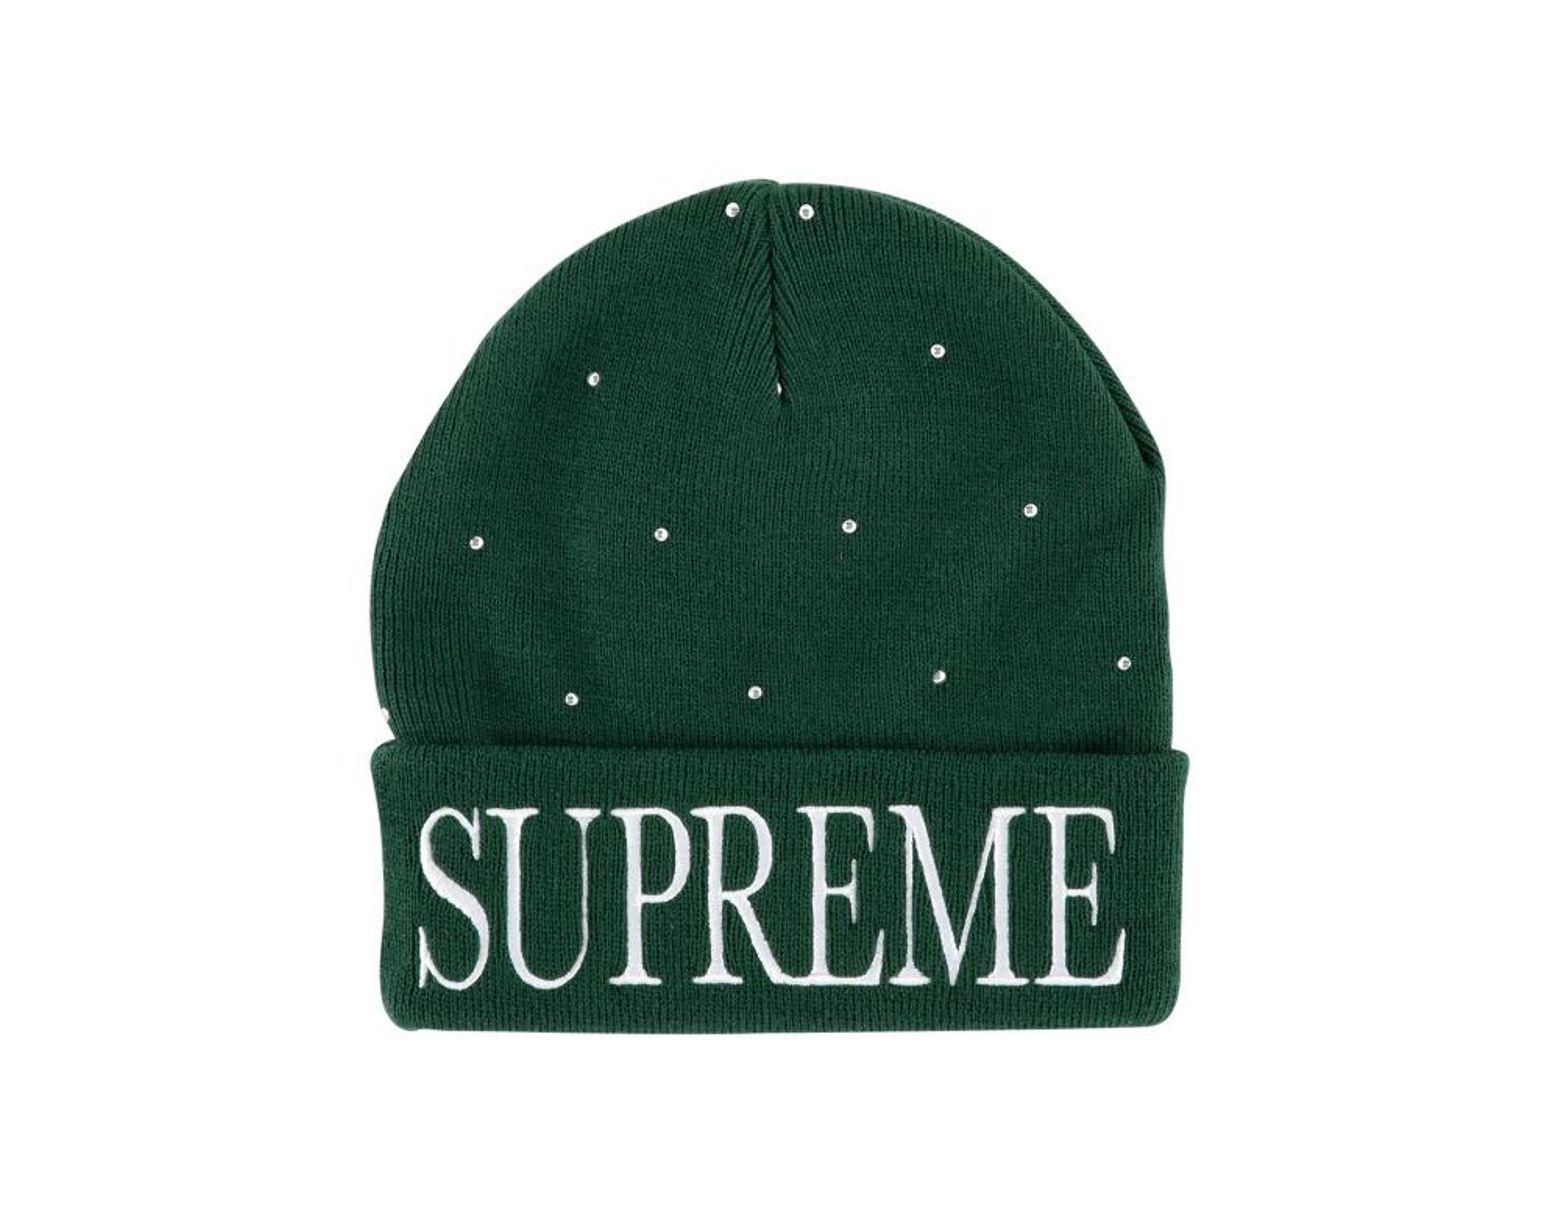 346b130bba0e4 Supreme Studded Beanie in Green for Men - Lyst